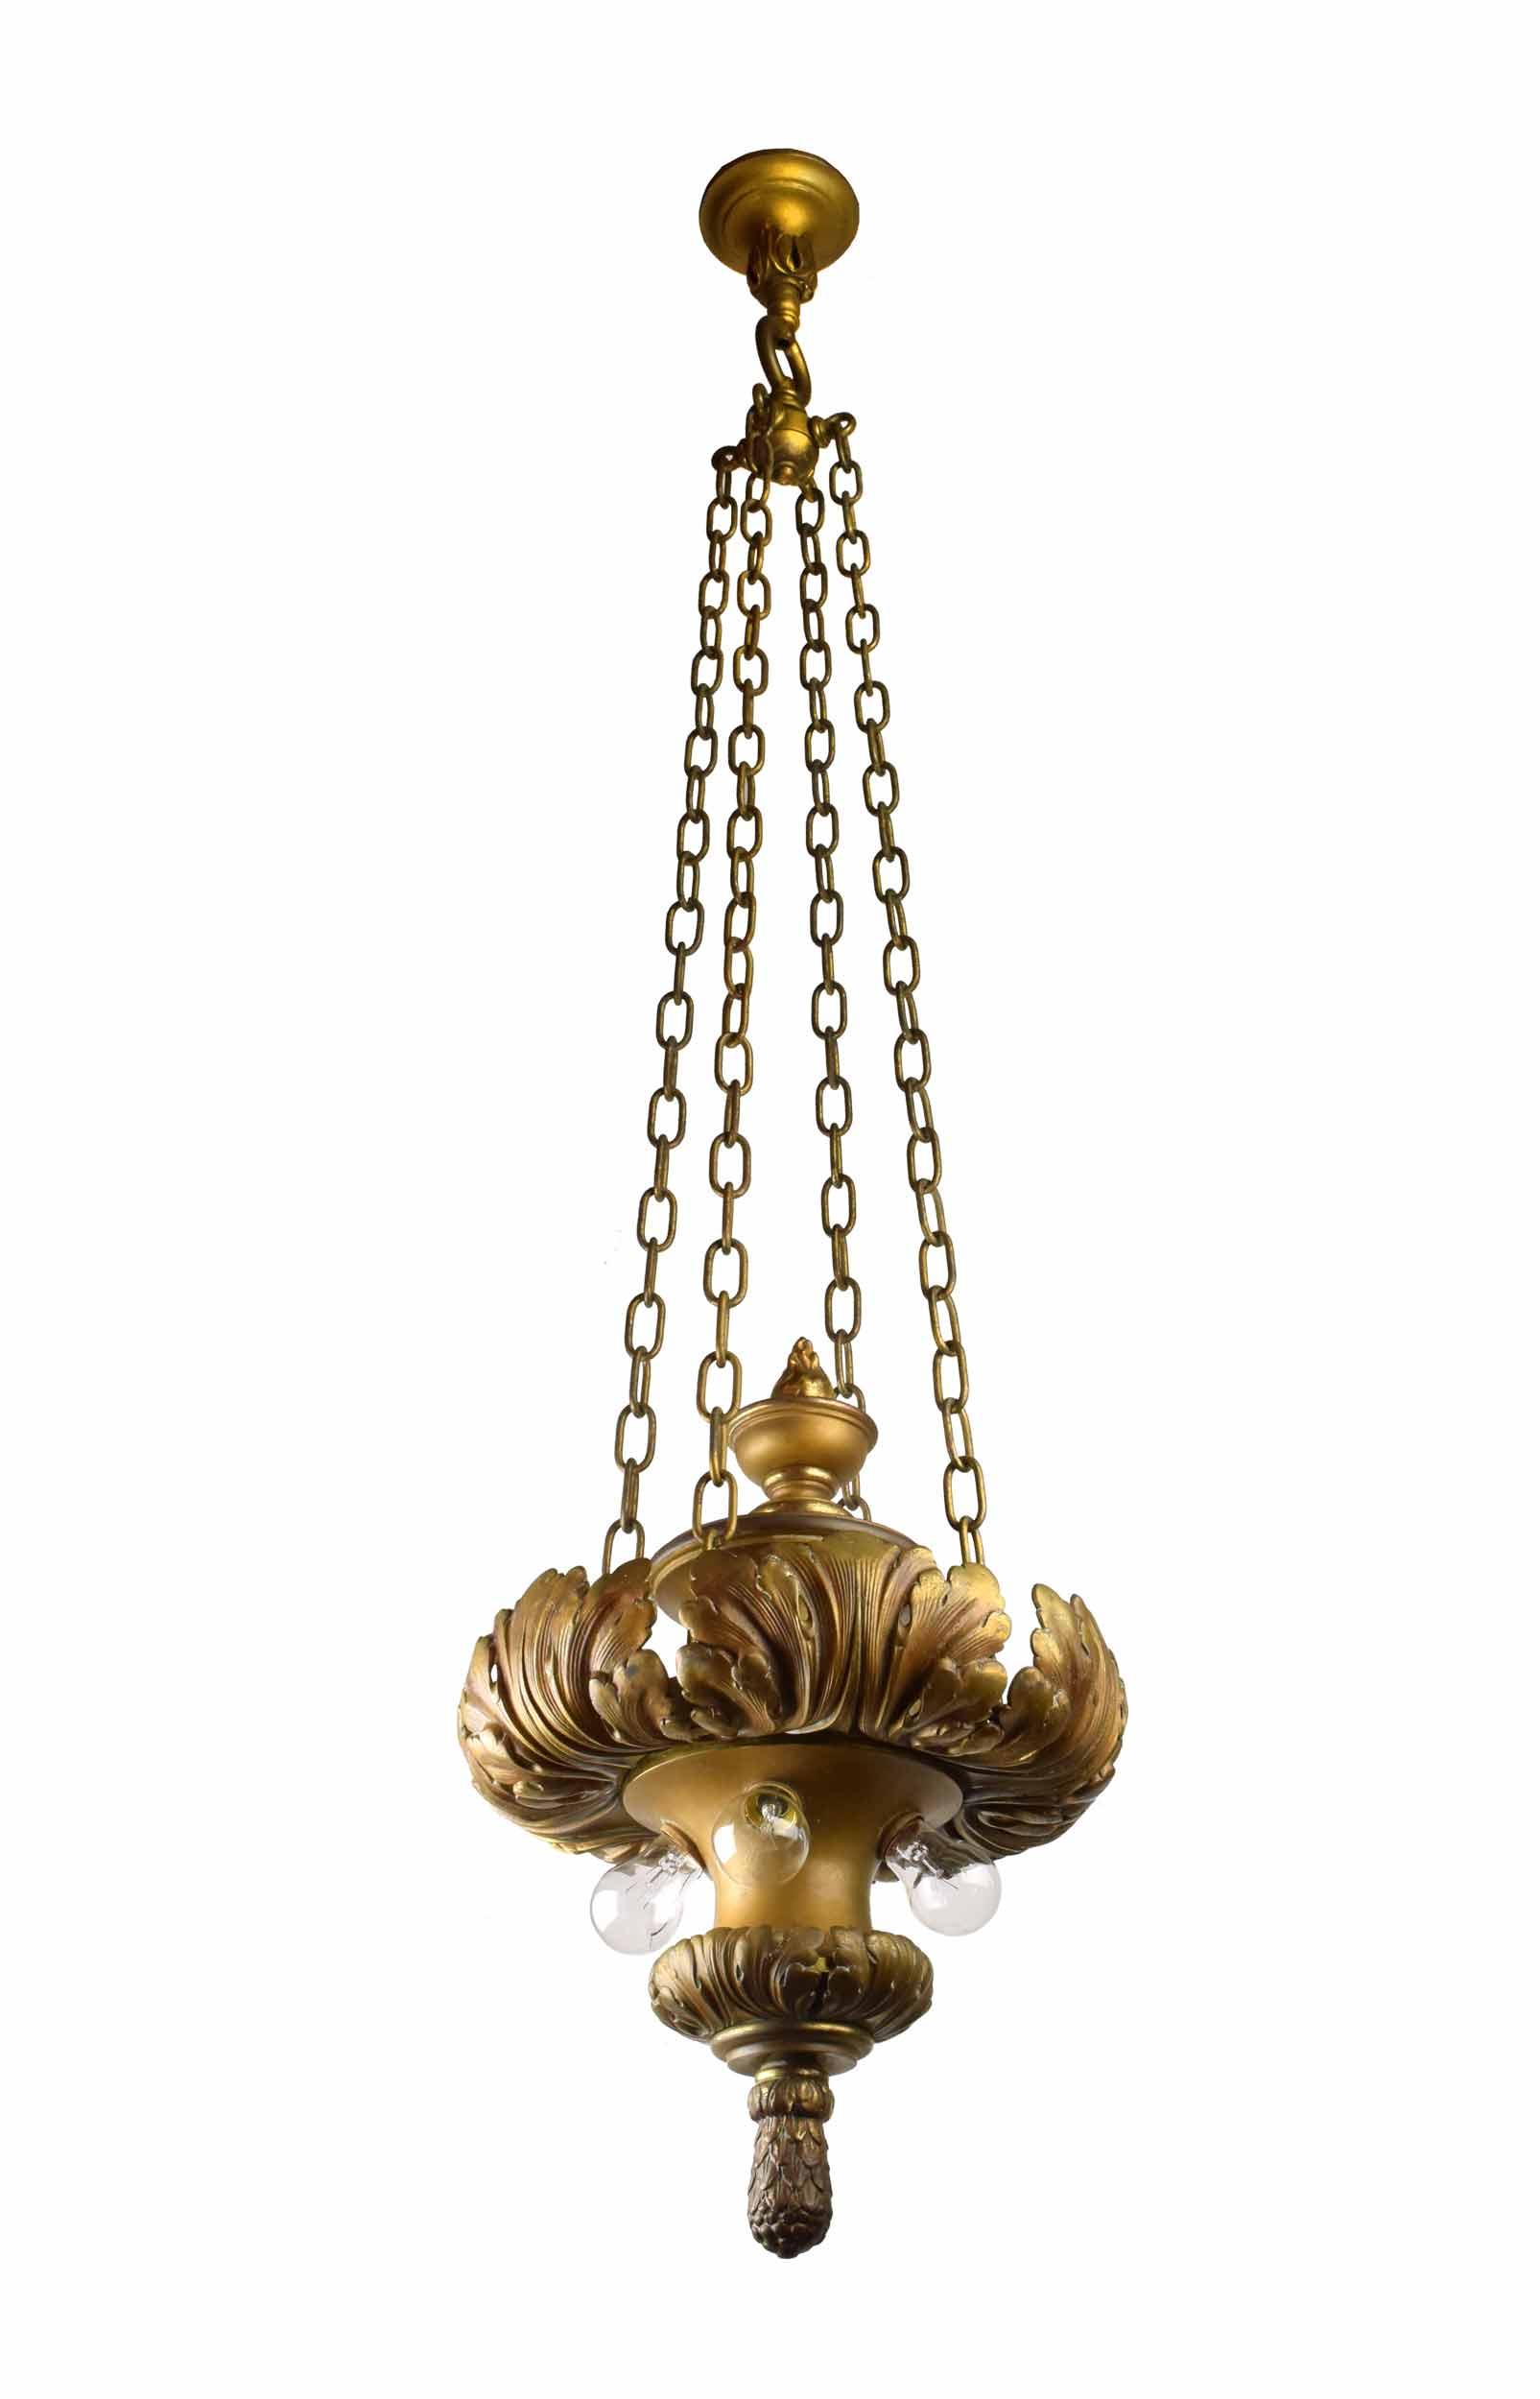 46966-brass-bank-pendant-lower-angle.jpg